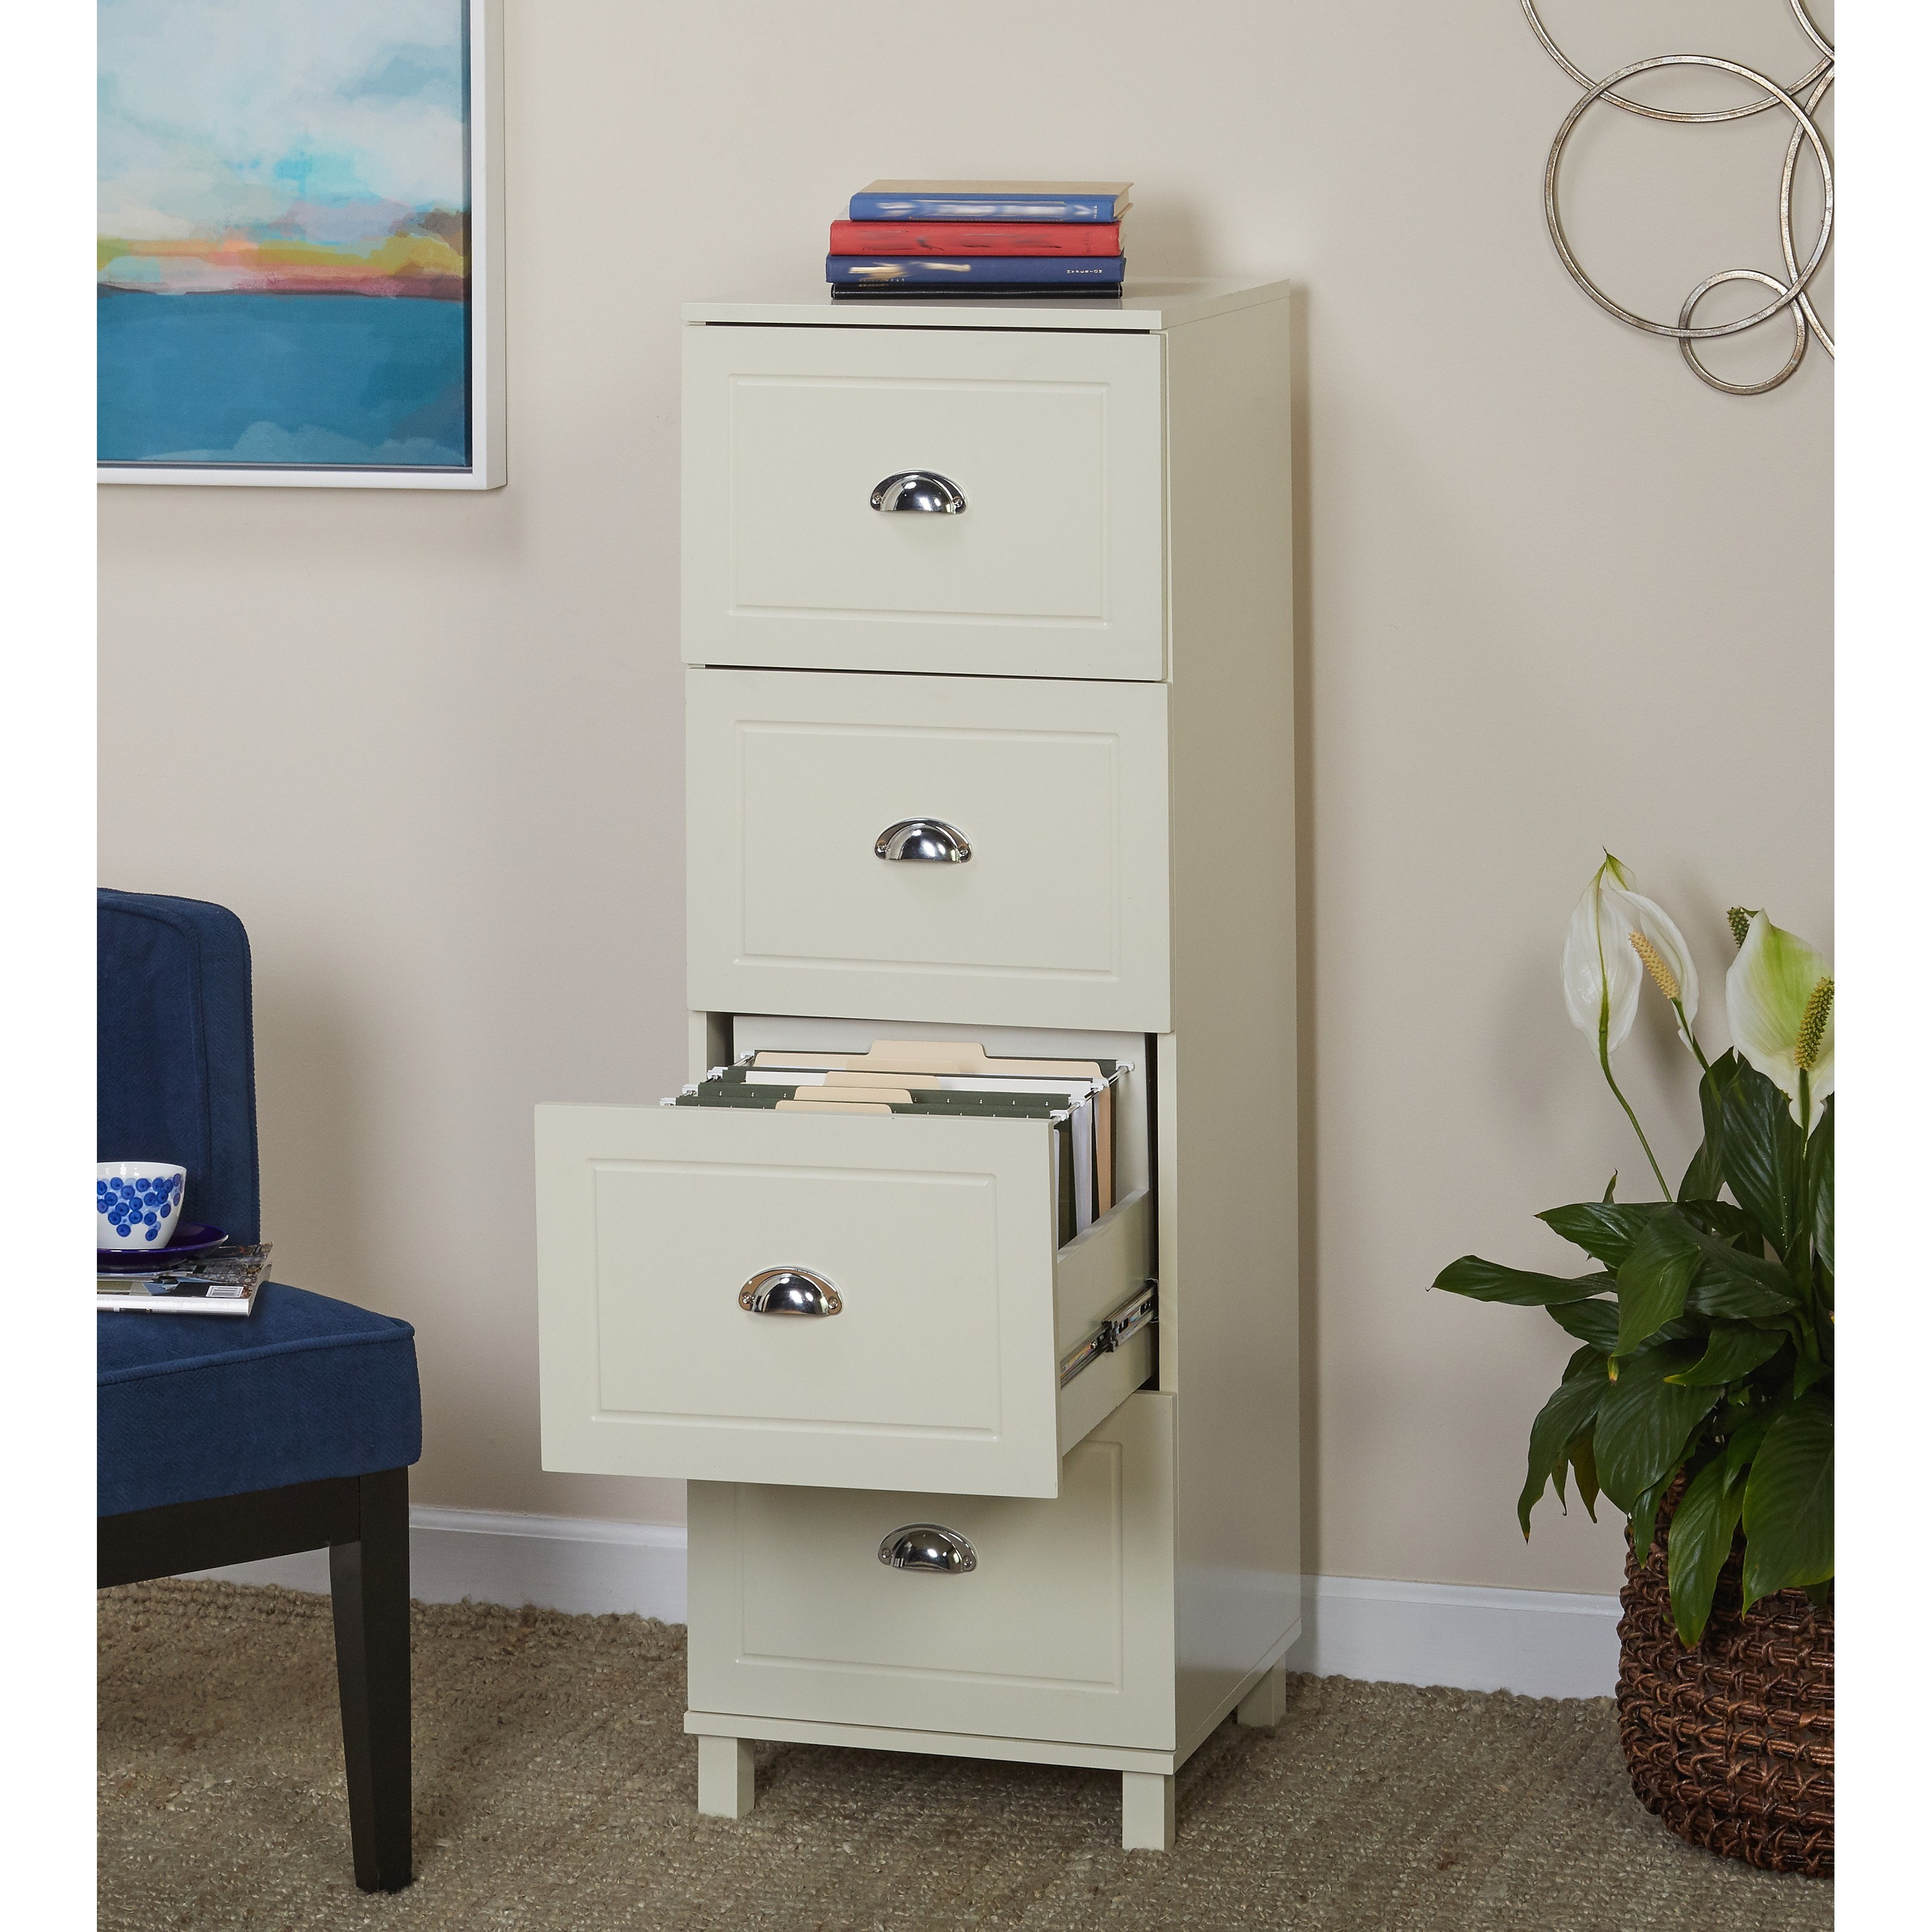 Image of: Bradley 4 Drawer Vertical Wood Filing Cabinet White Walmart Com Walmart Com